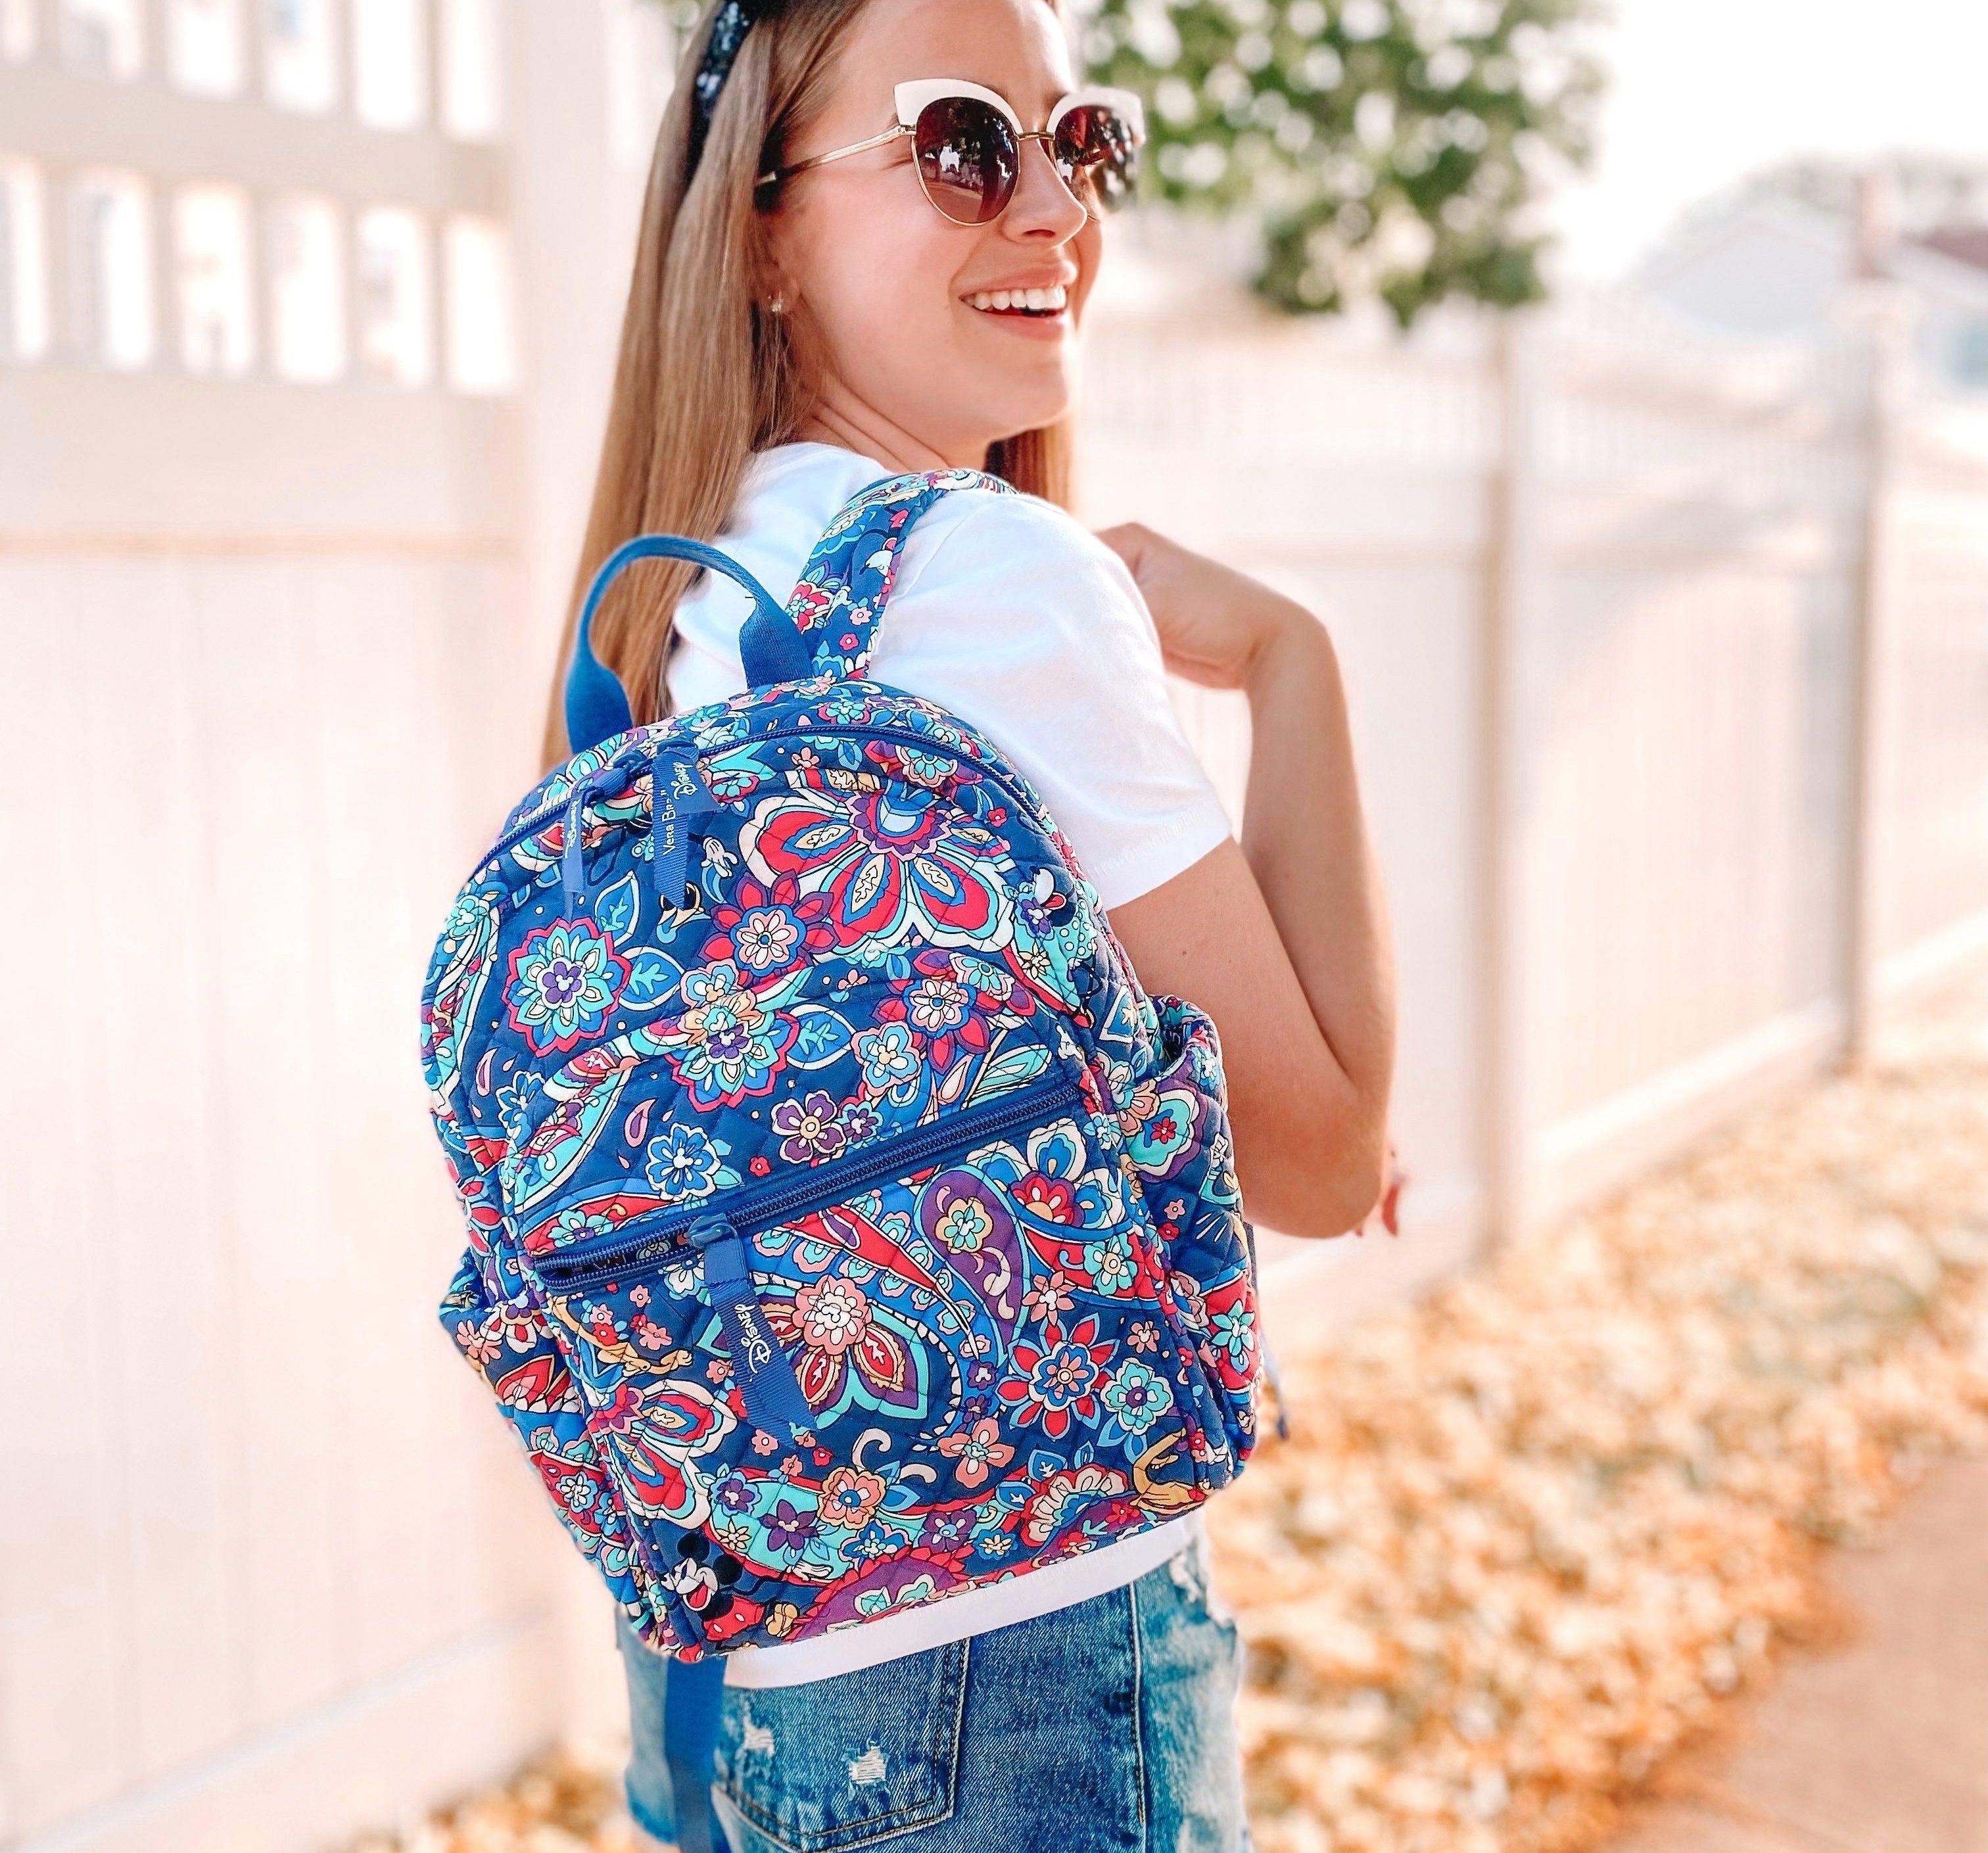 My Favorite Vera Bradley x Disney Bag